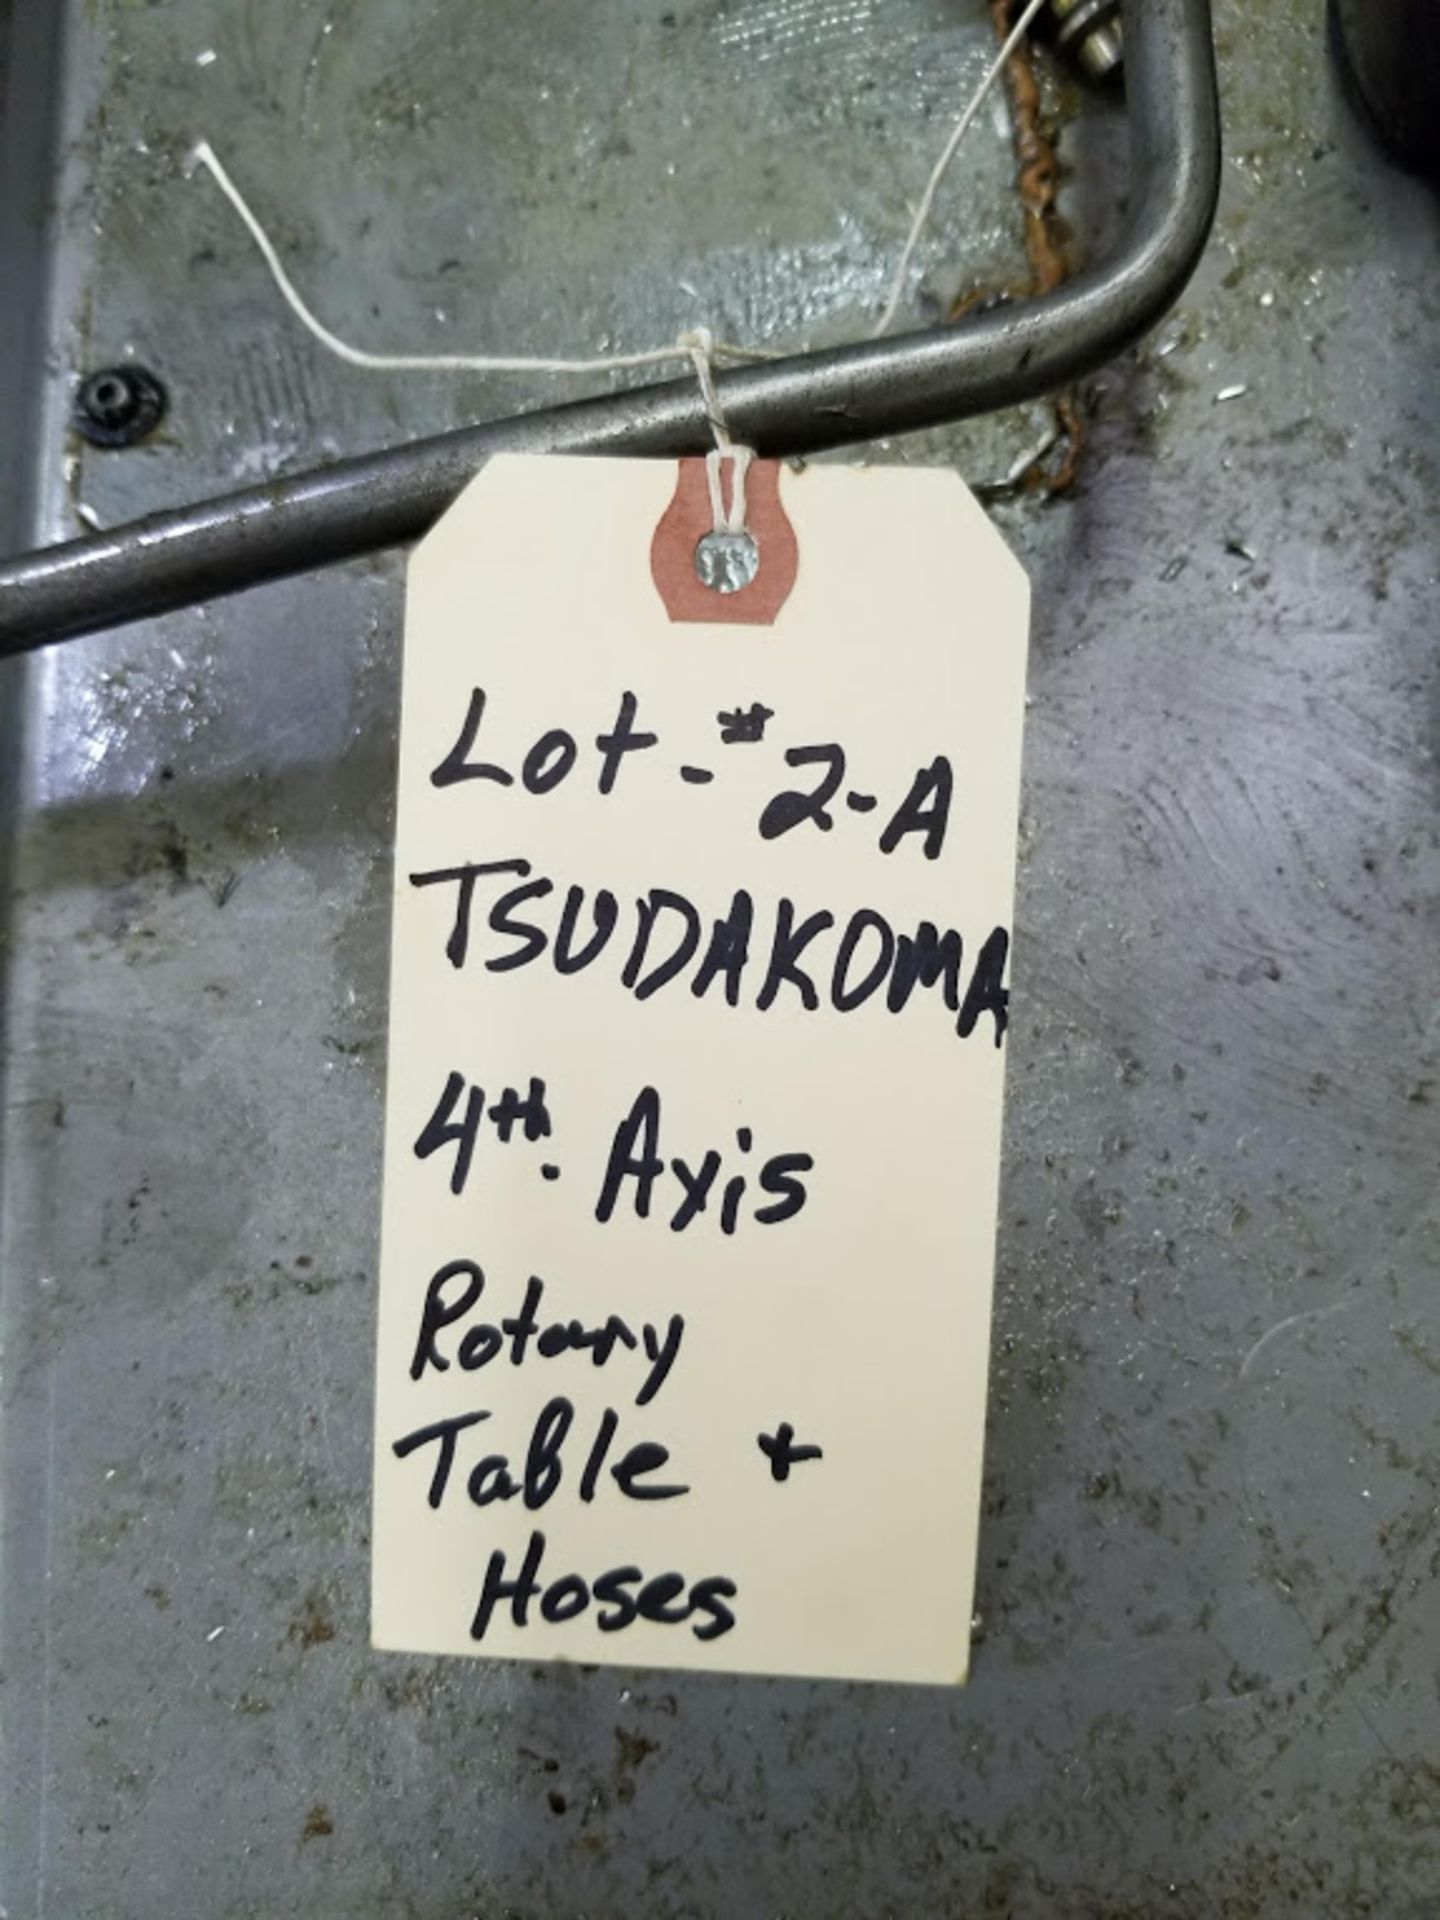 Lot 2A - TSUDAKOMA 4th Axis Rotary Table wih hoses